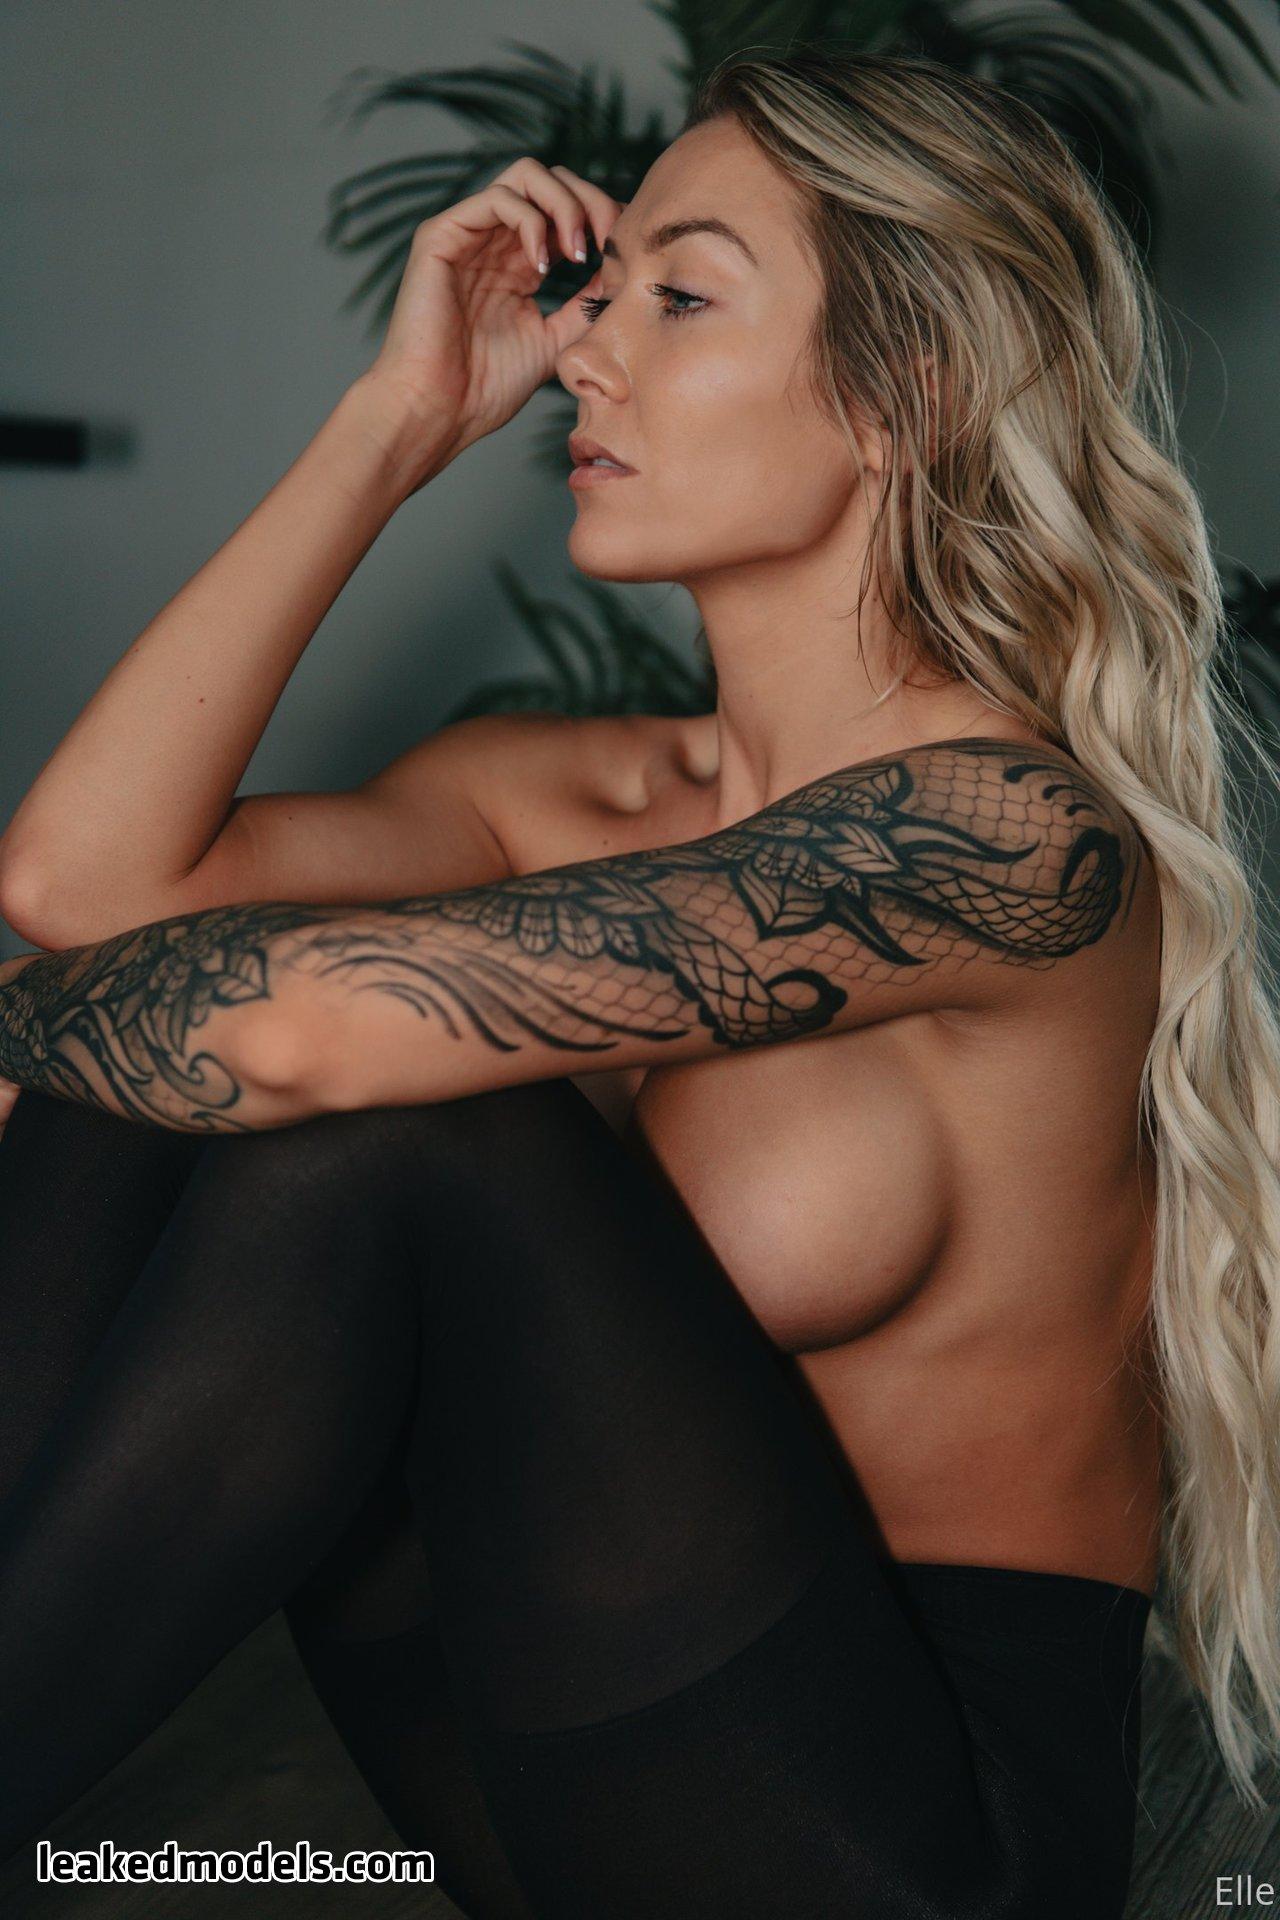 ellebelle1 leaked nude leakedmodels.com 0040 - Elle – ellebelle1 OnlyFans Nude Leaks (40 Photos)